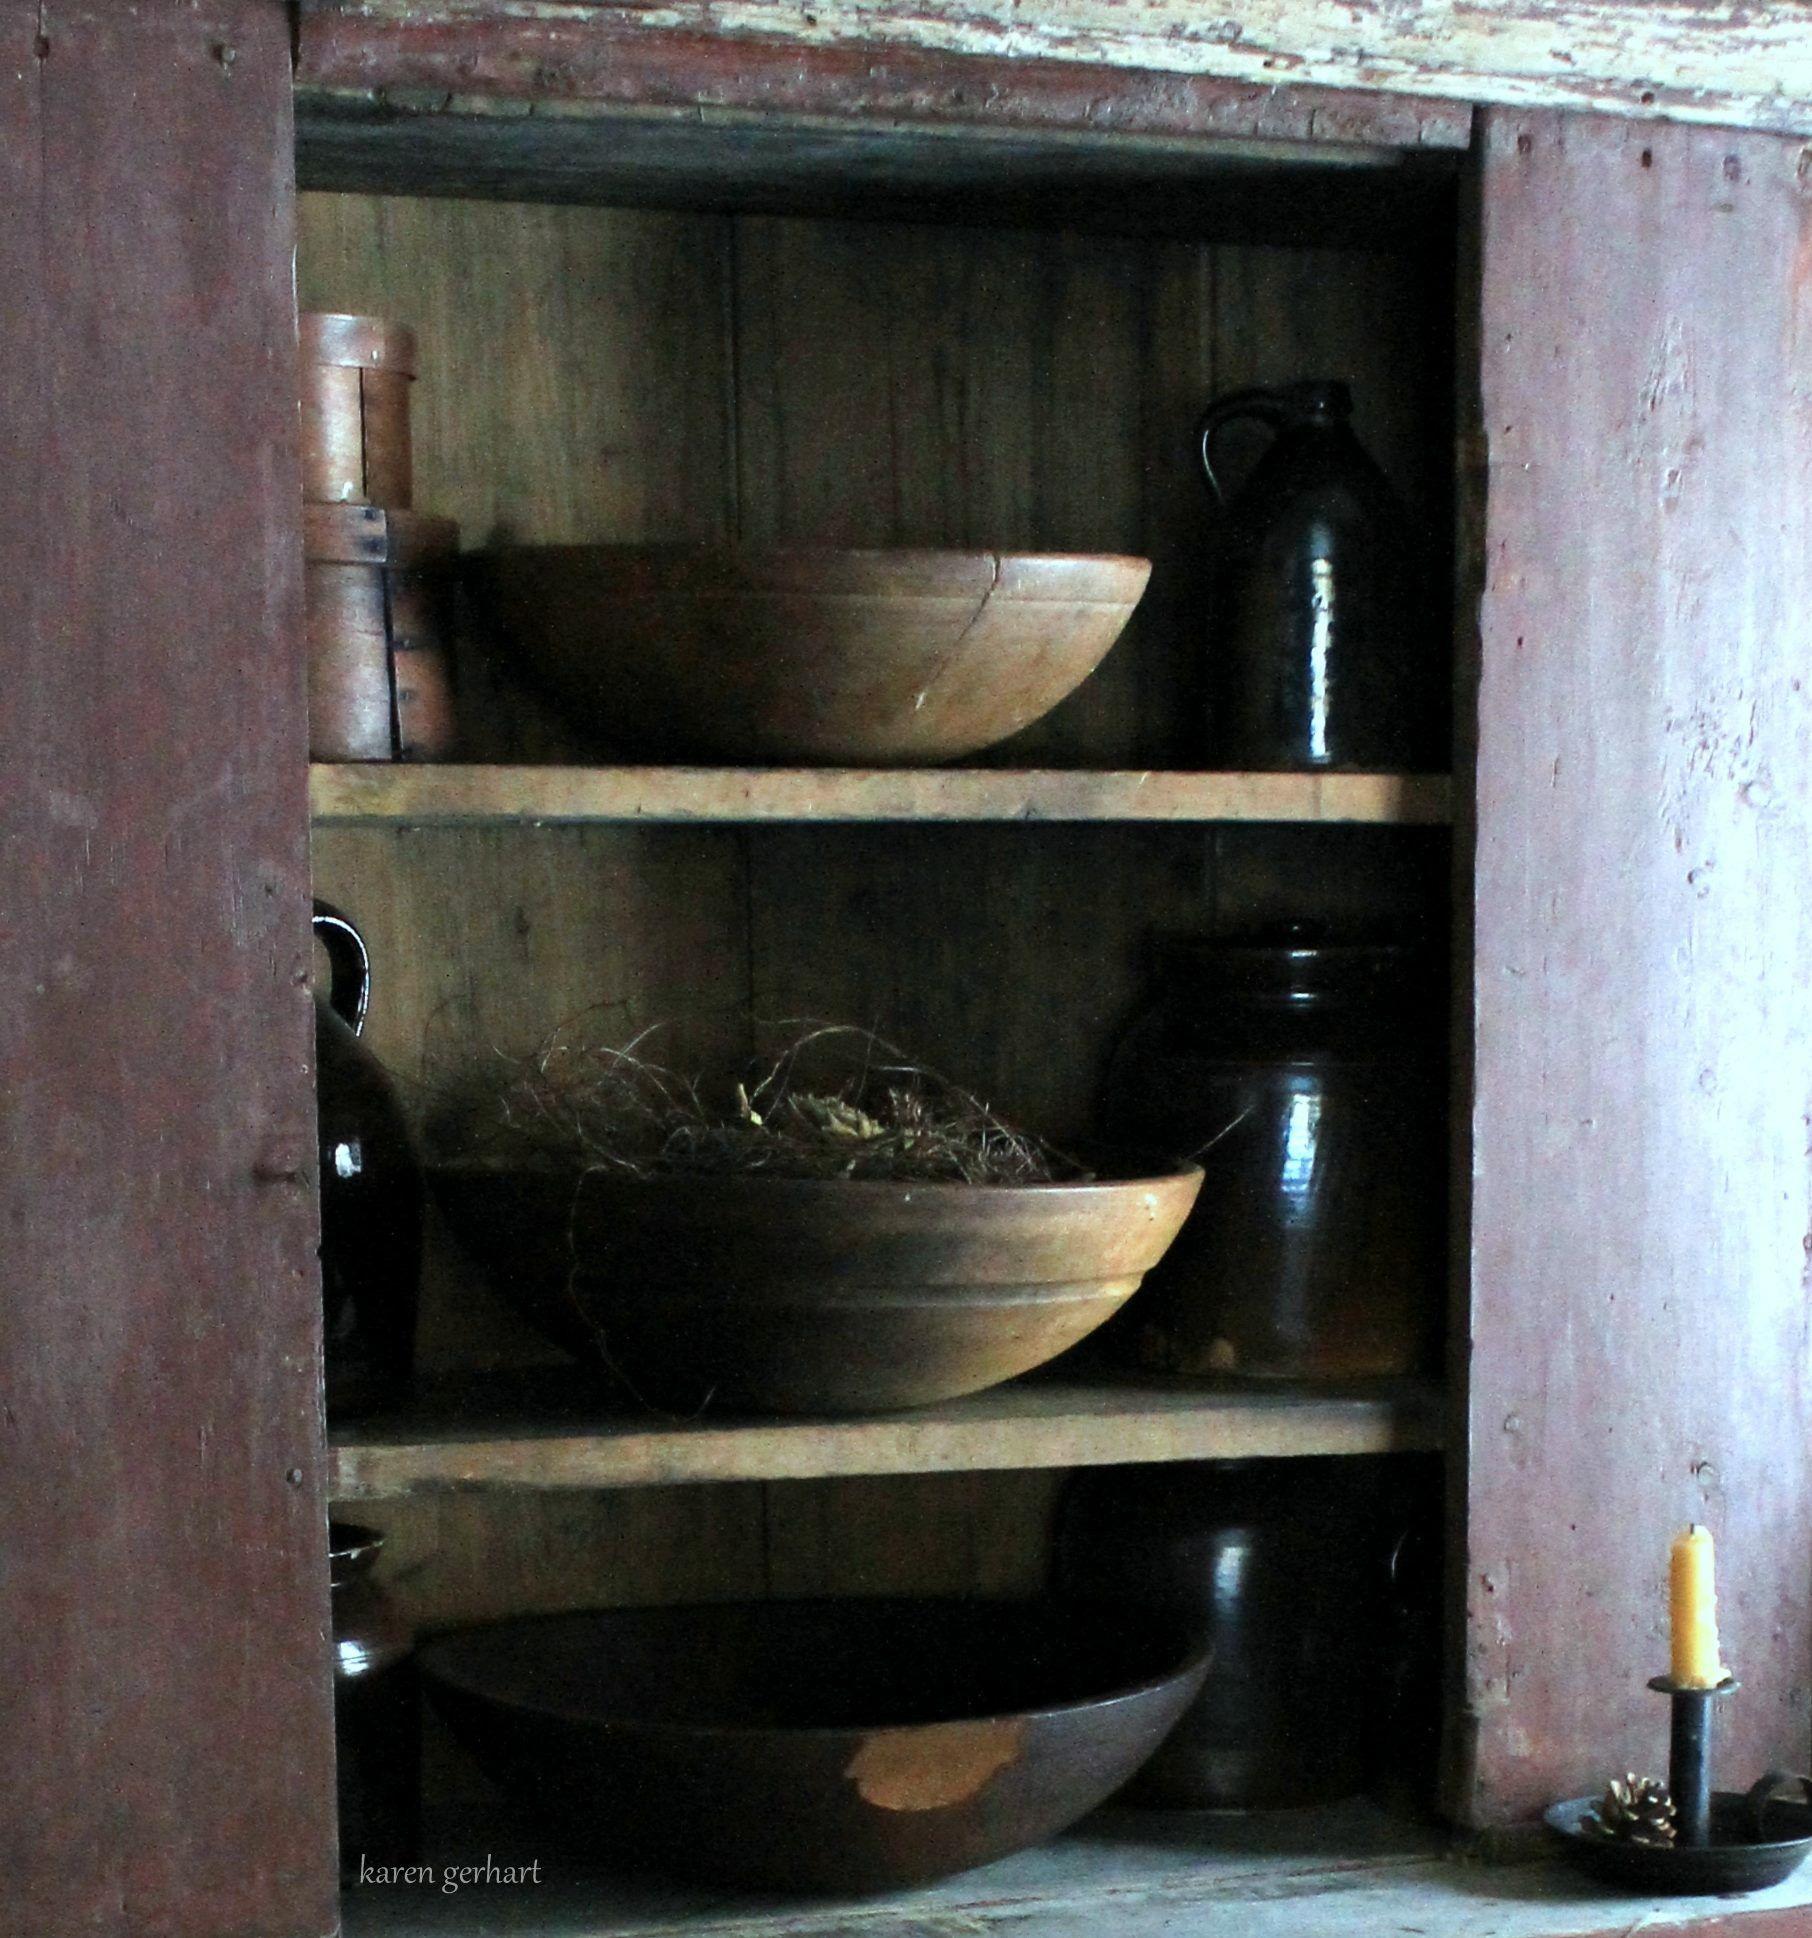 Pin By Virginia Clarkson On Karen Gerhart Wooden Bowls Primitive Decorating Beautiful Decor